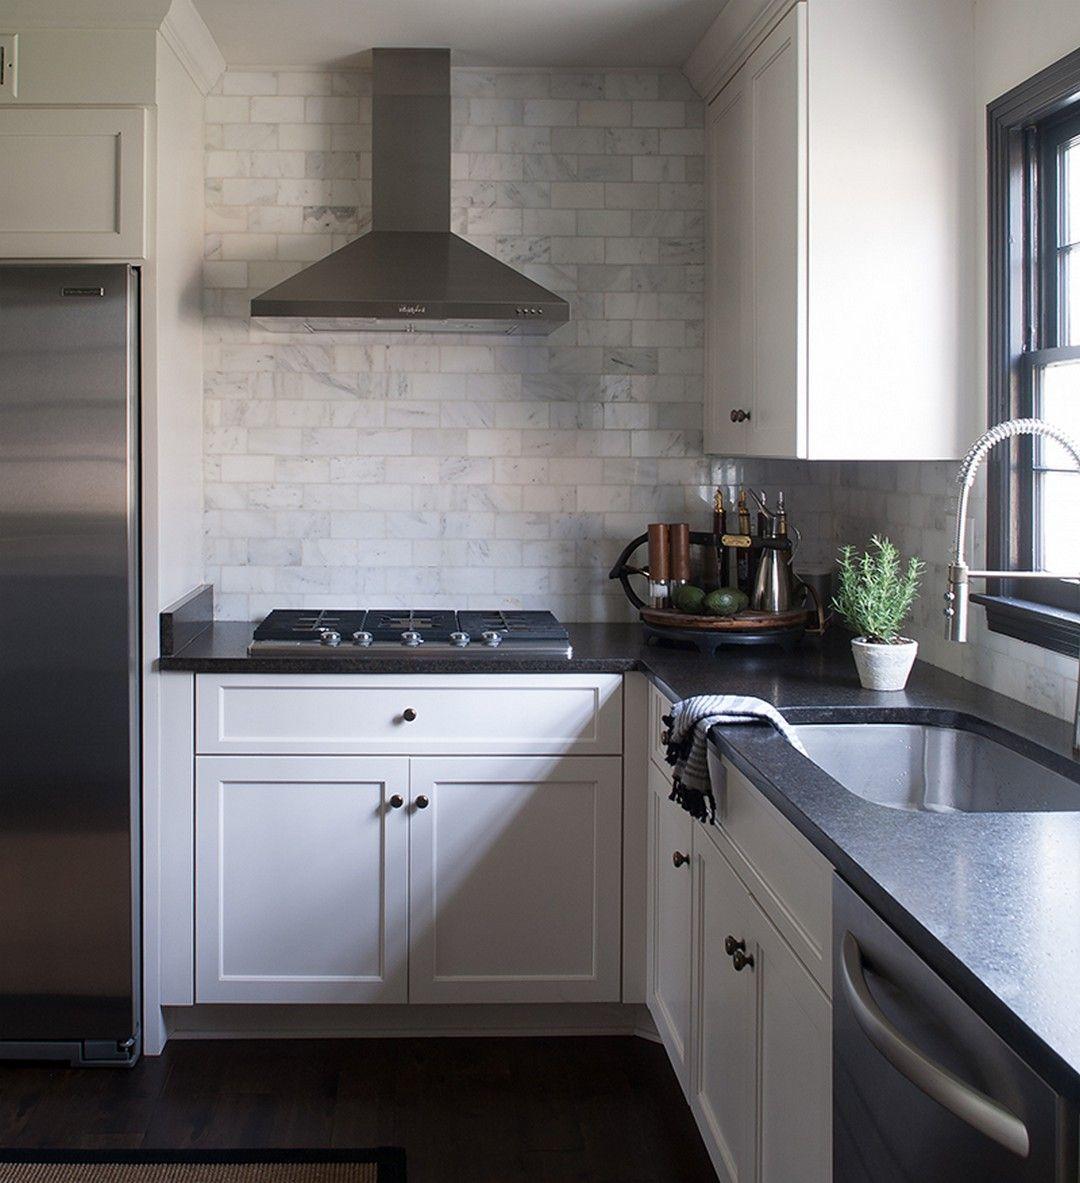 kitchen backsplash with black granite 99 design ideas black kitchen backsplash with black granite 99 design ideas